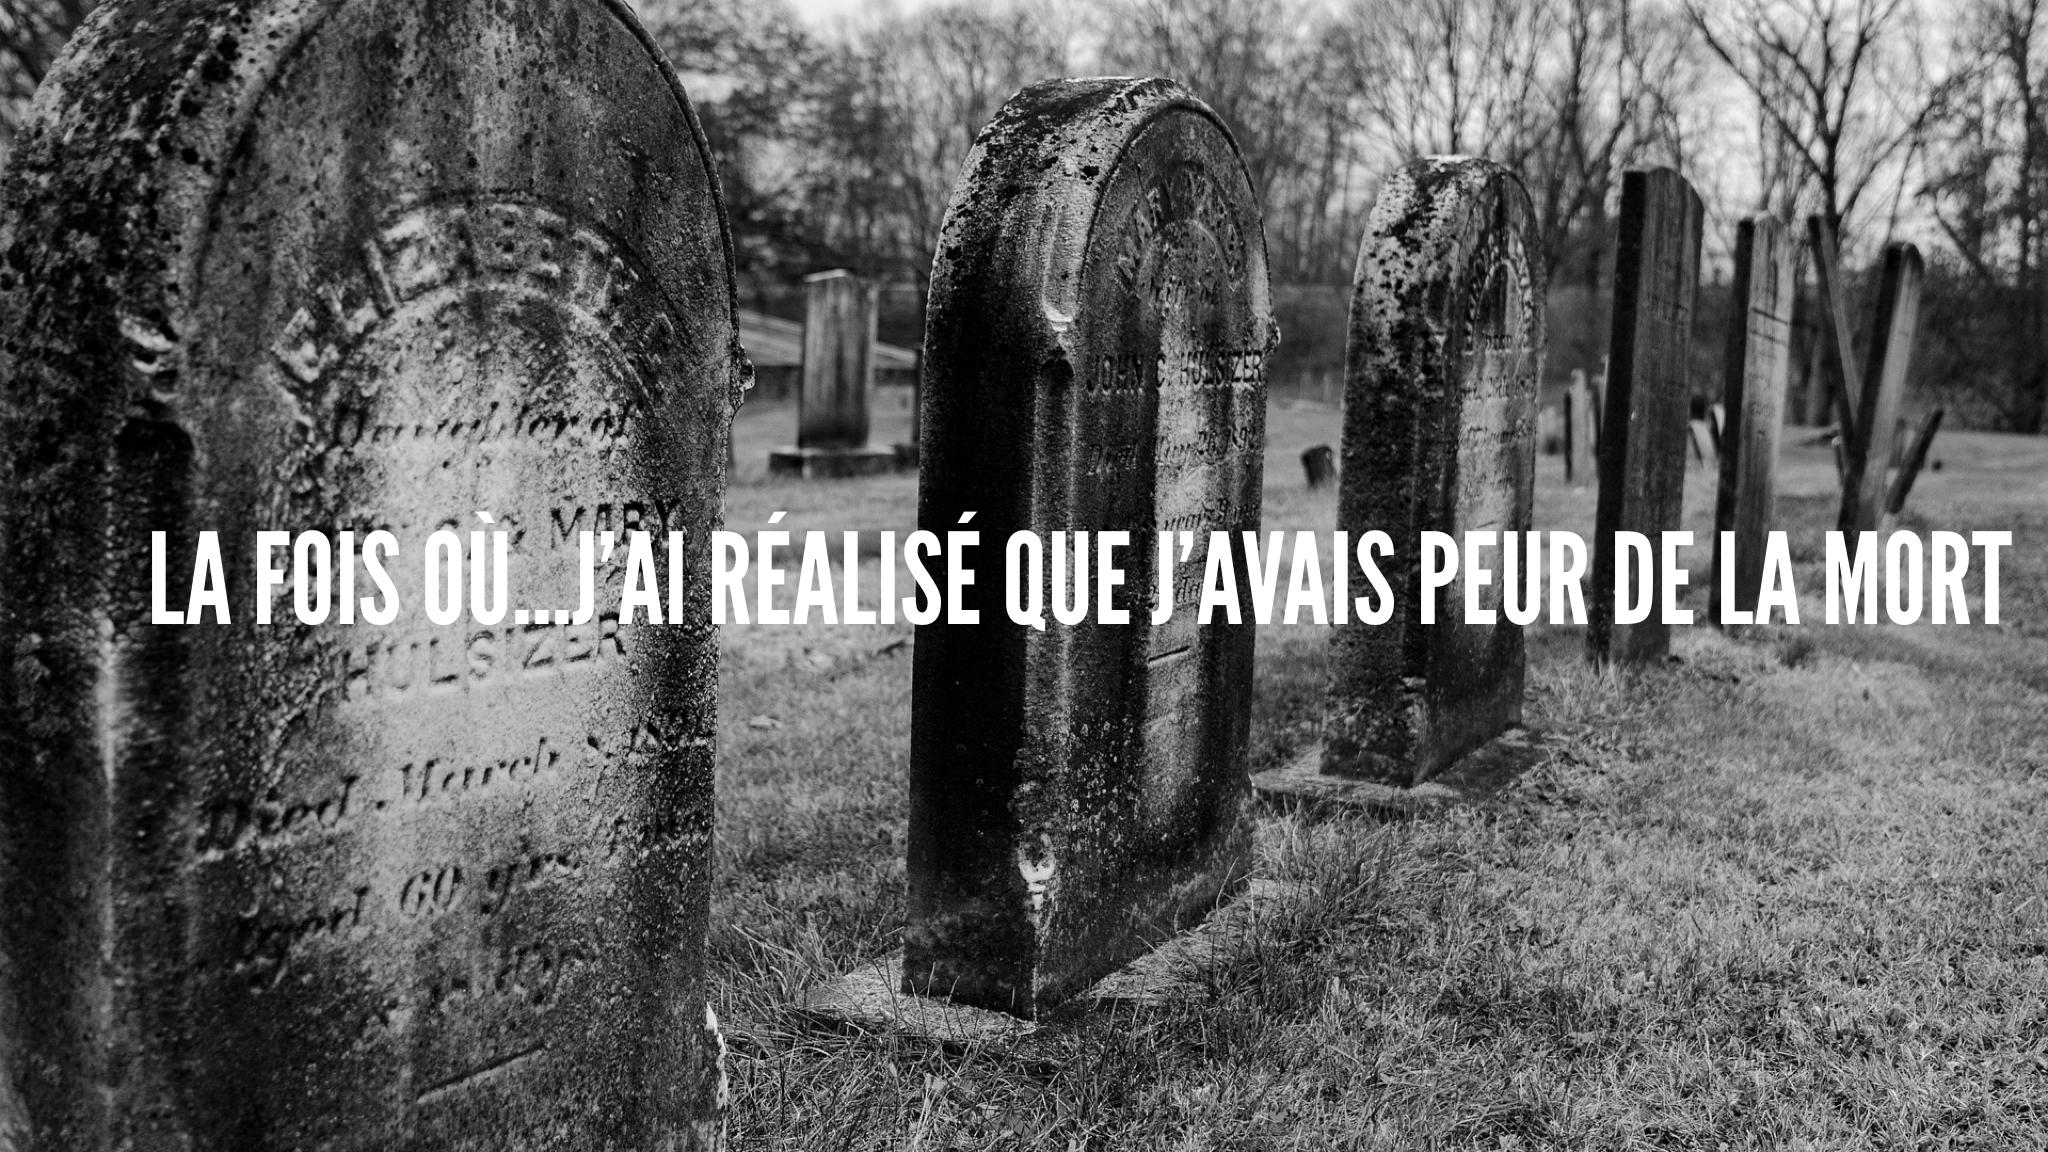 La fois où...peur de la mort